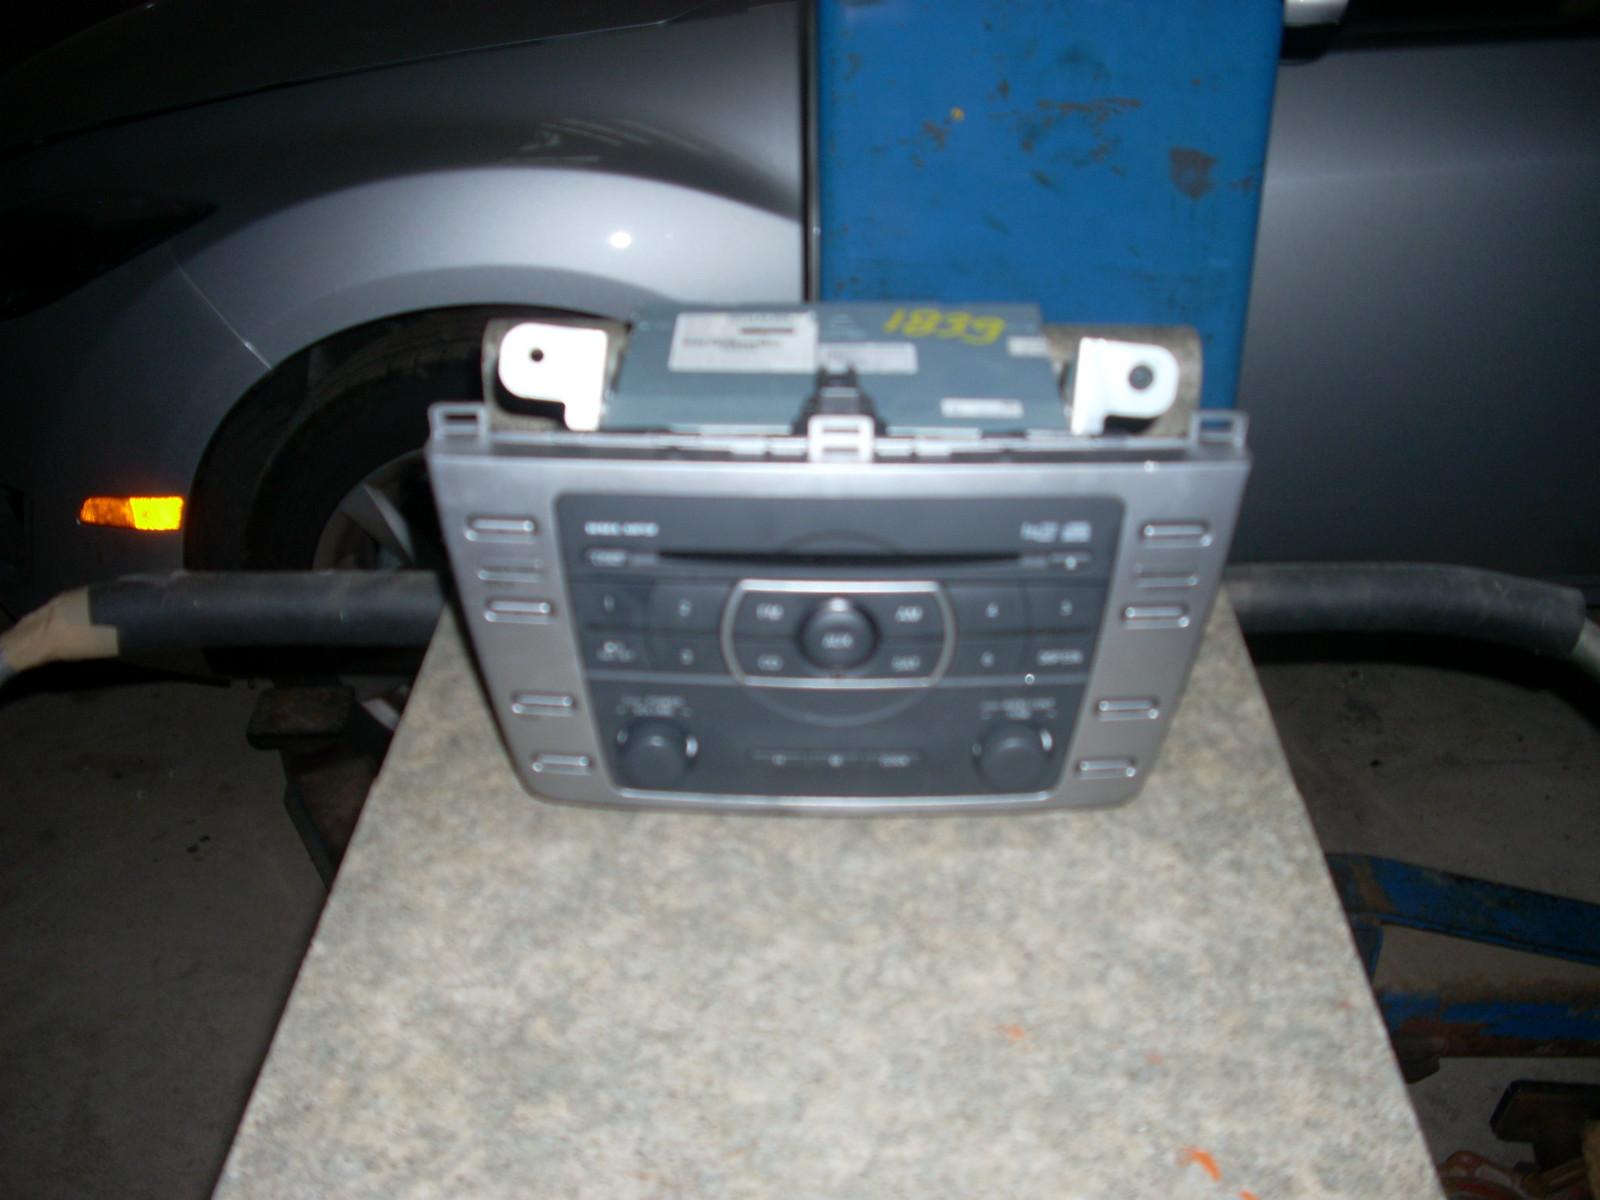 1839  radio 1839 id  geg4669rx